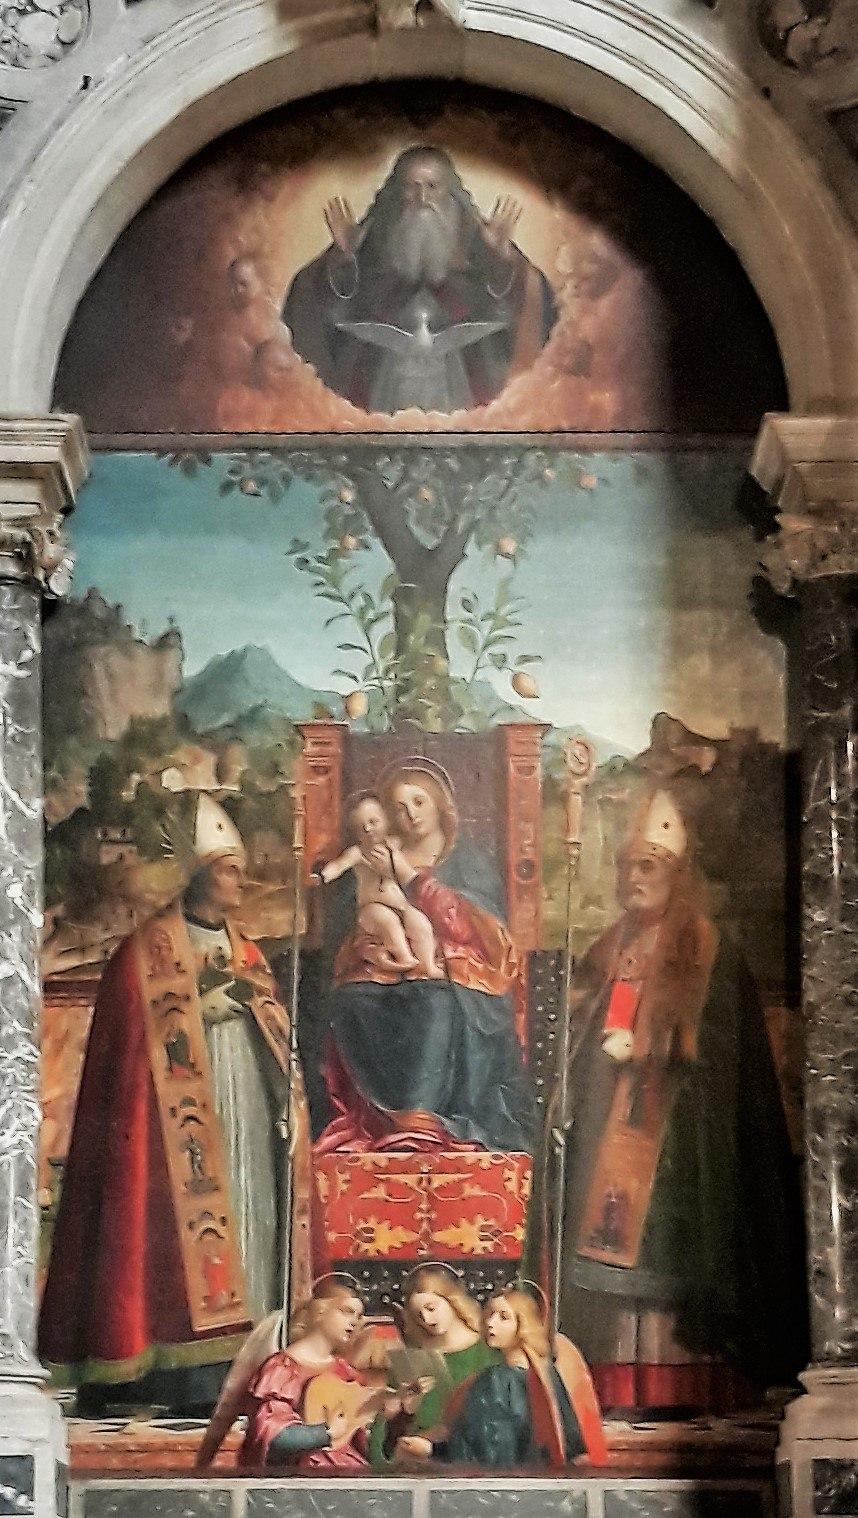 Girolamo Dai Libri - Madonna Della Cintura